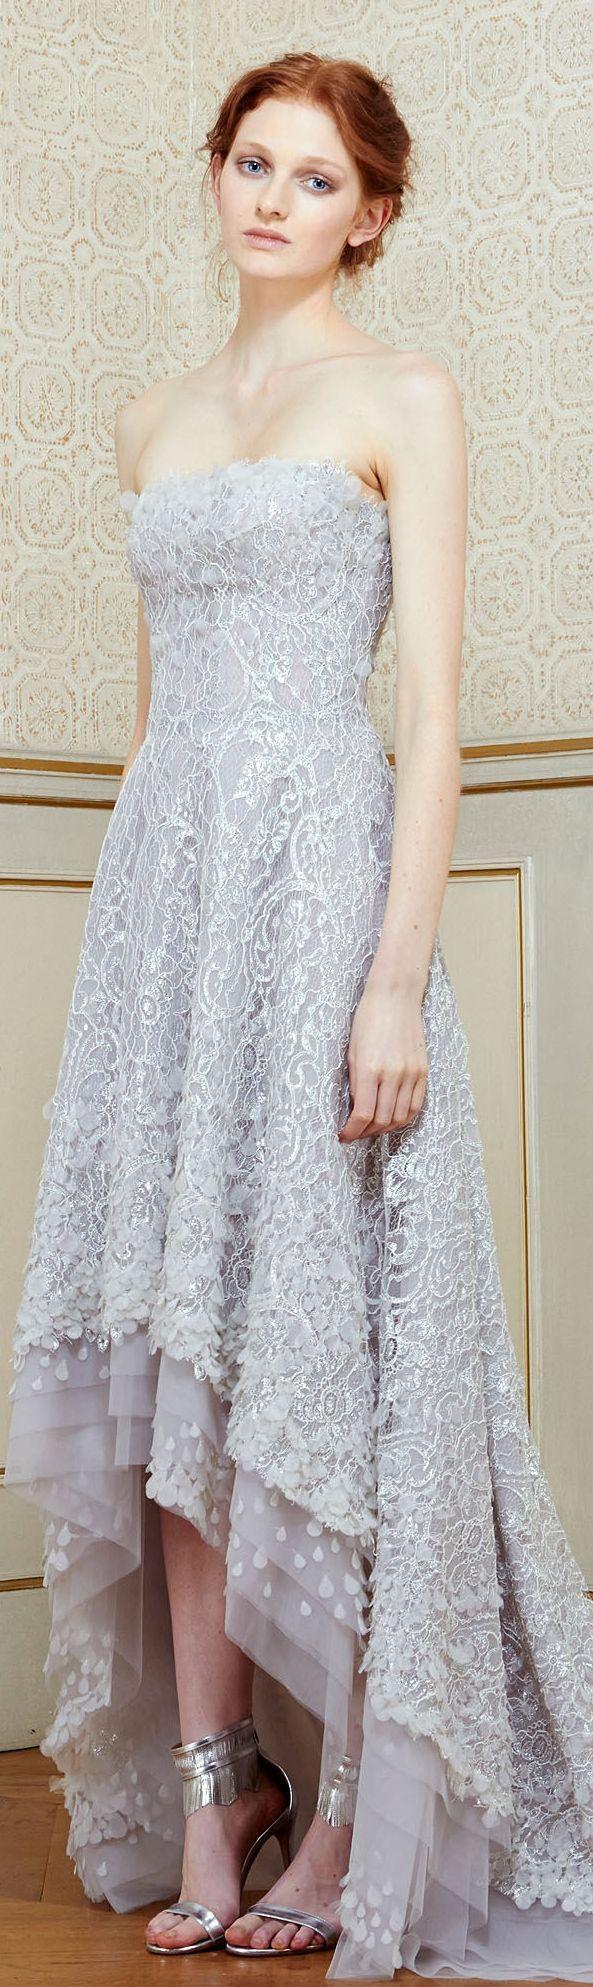 Mariage - Rami Al Ali Couture Sprint Été 2014